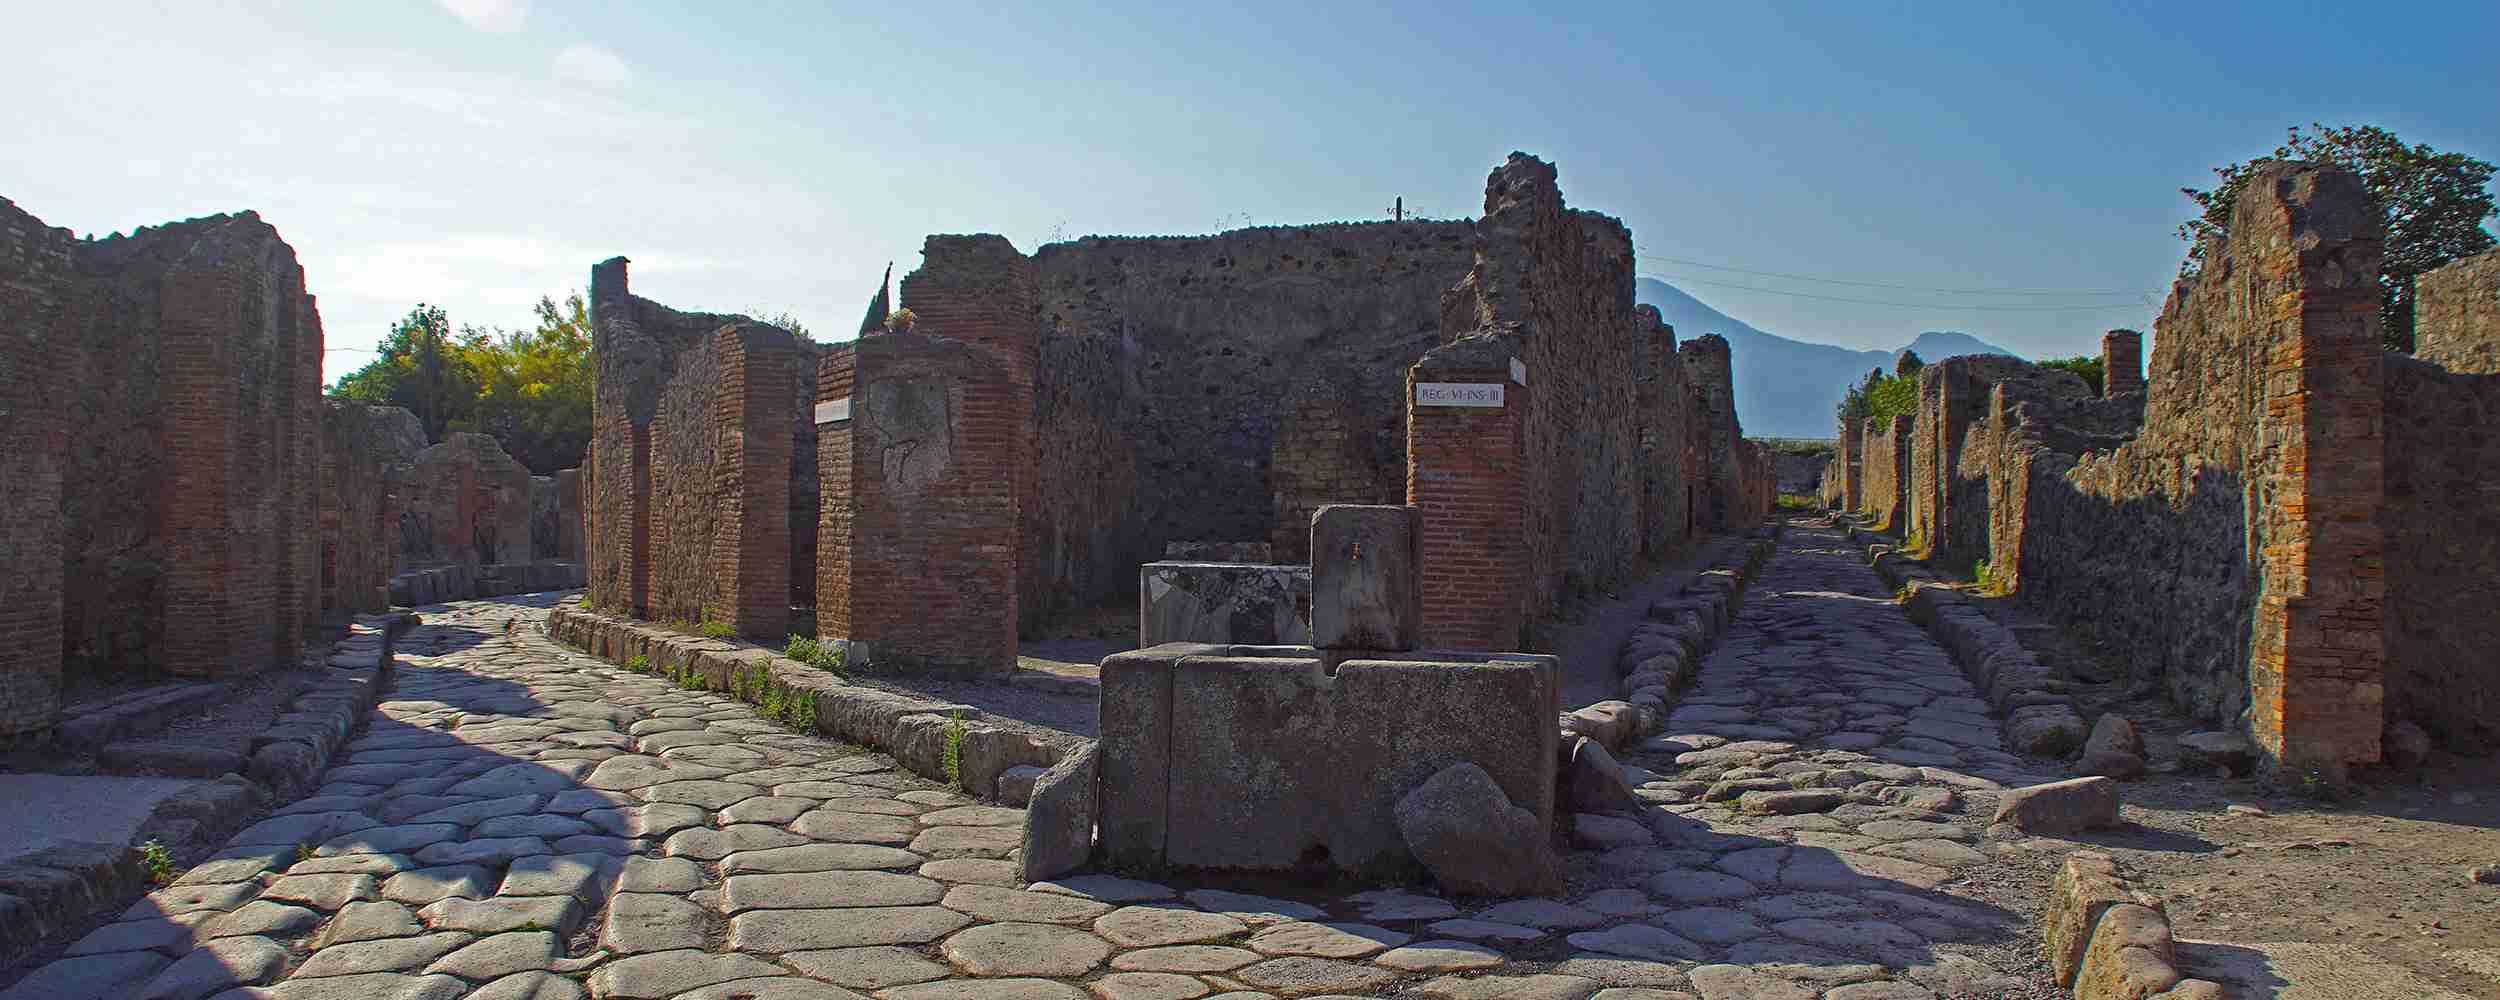 Visita guidata Pompei e Sorrento